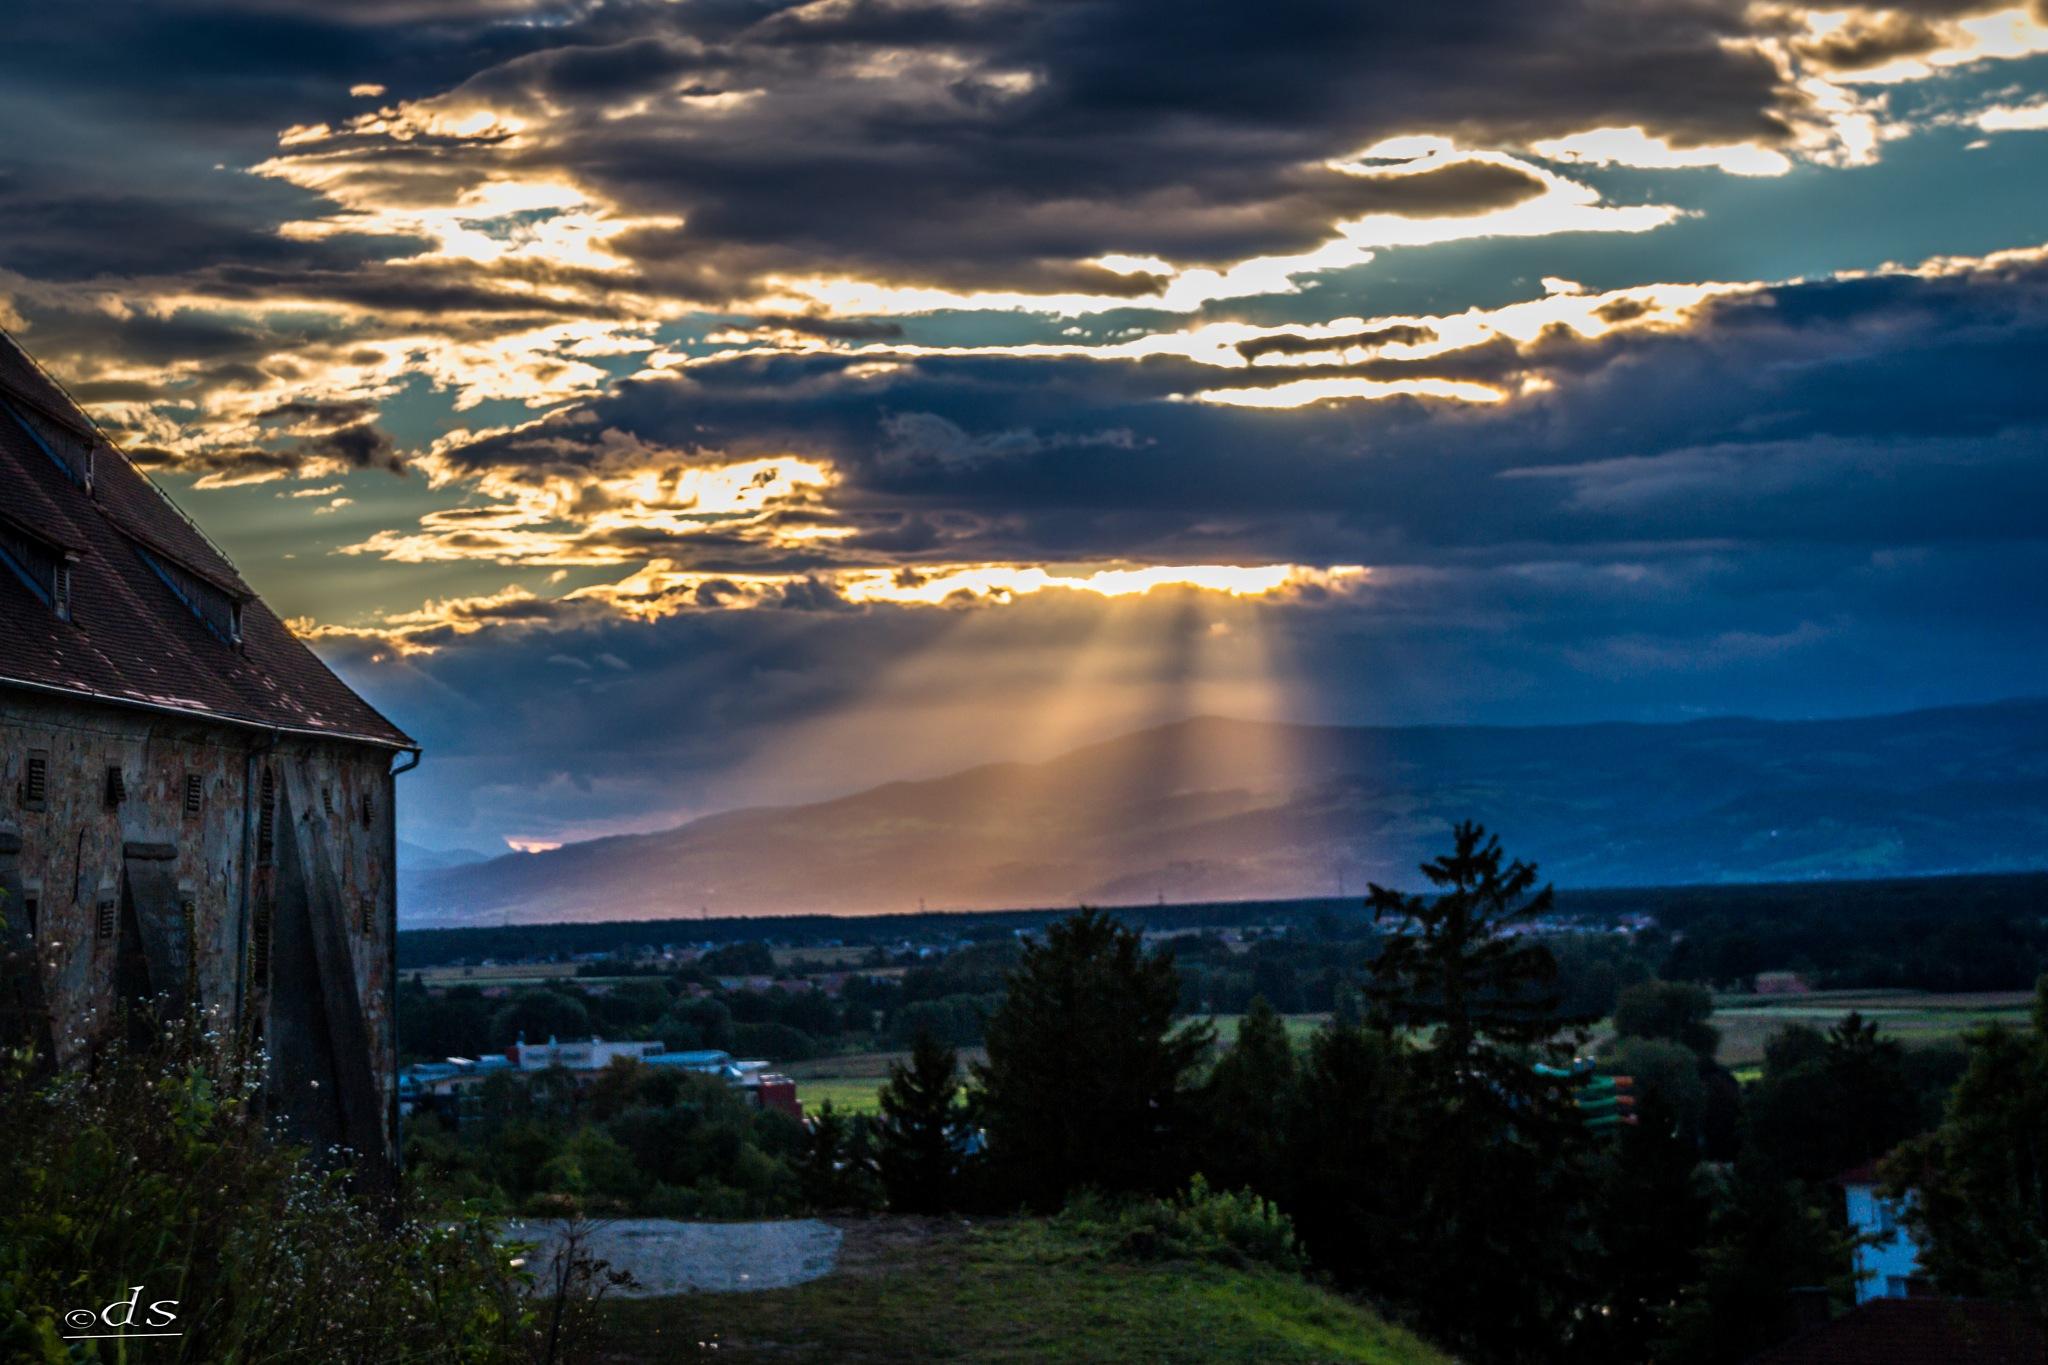 Sunset by Darko Solina